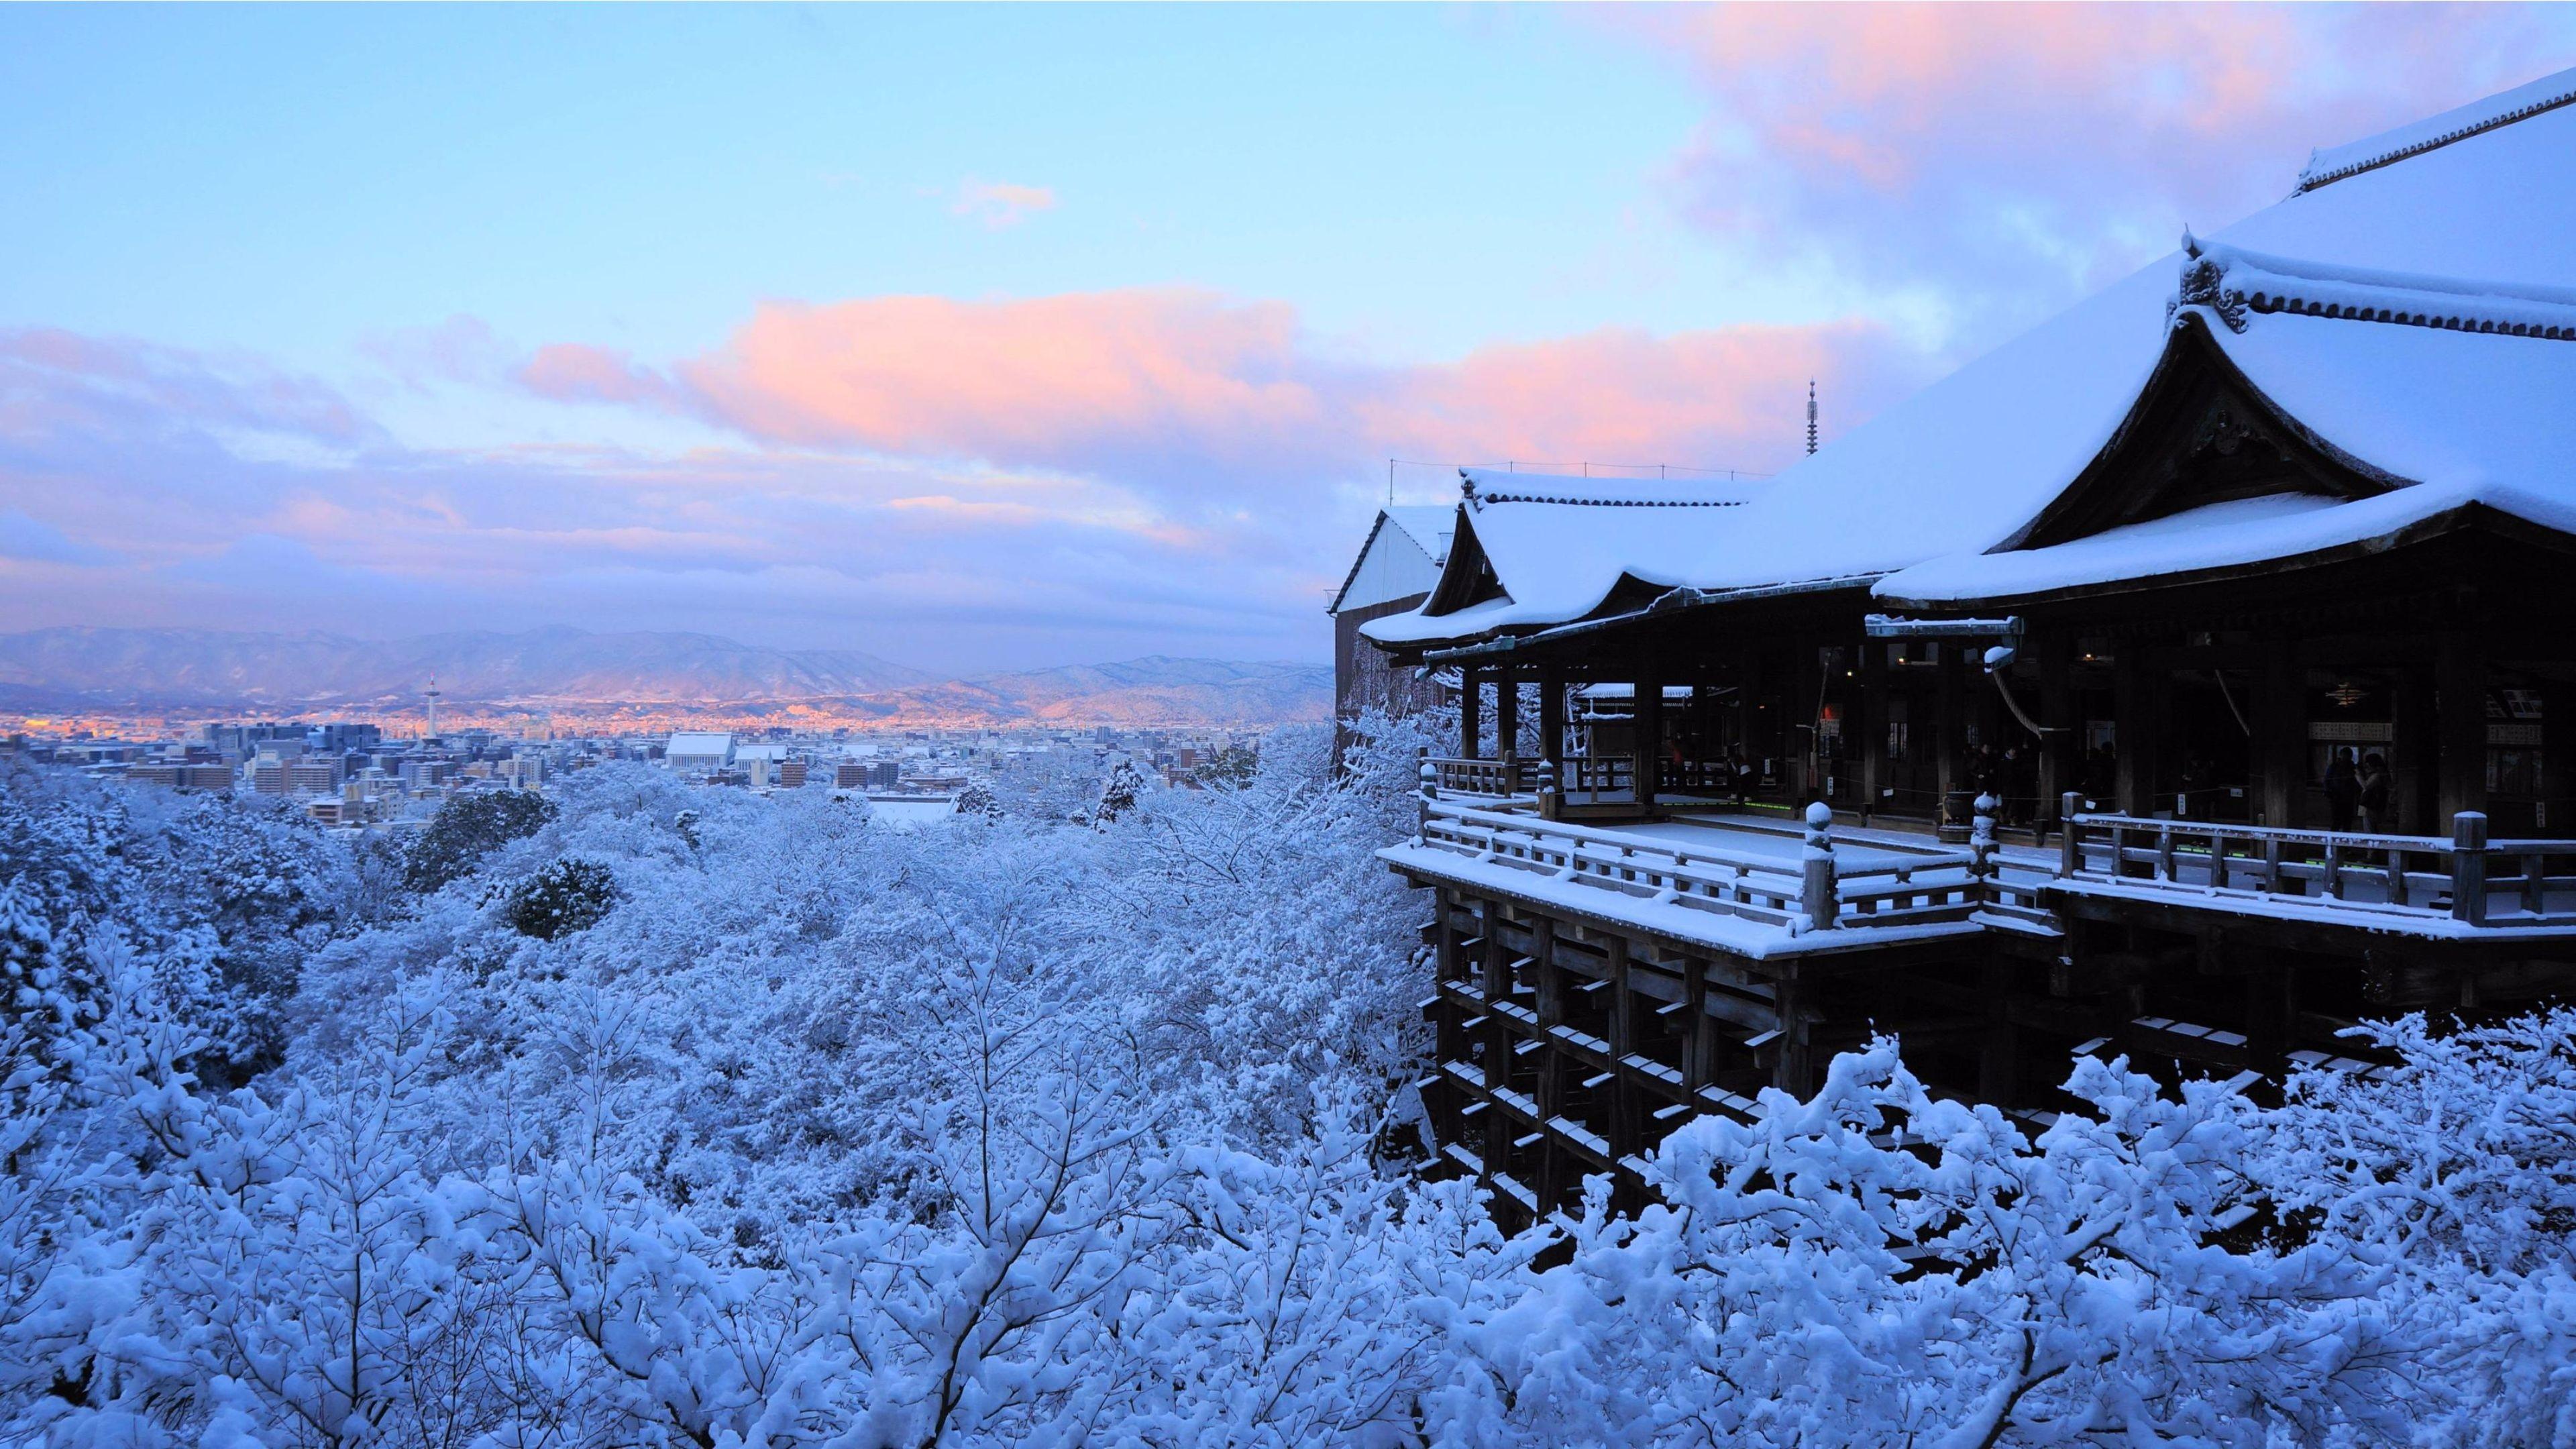 Amazing Winter 2016 Kyoto, Japan 4K Wallpaper | Free 4K Wallpaper